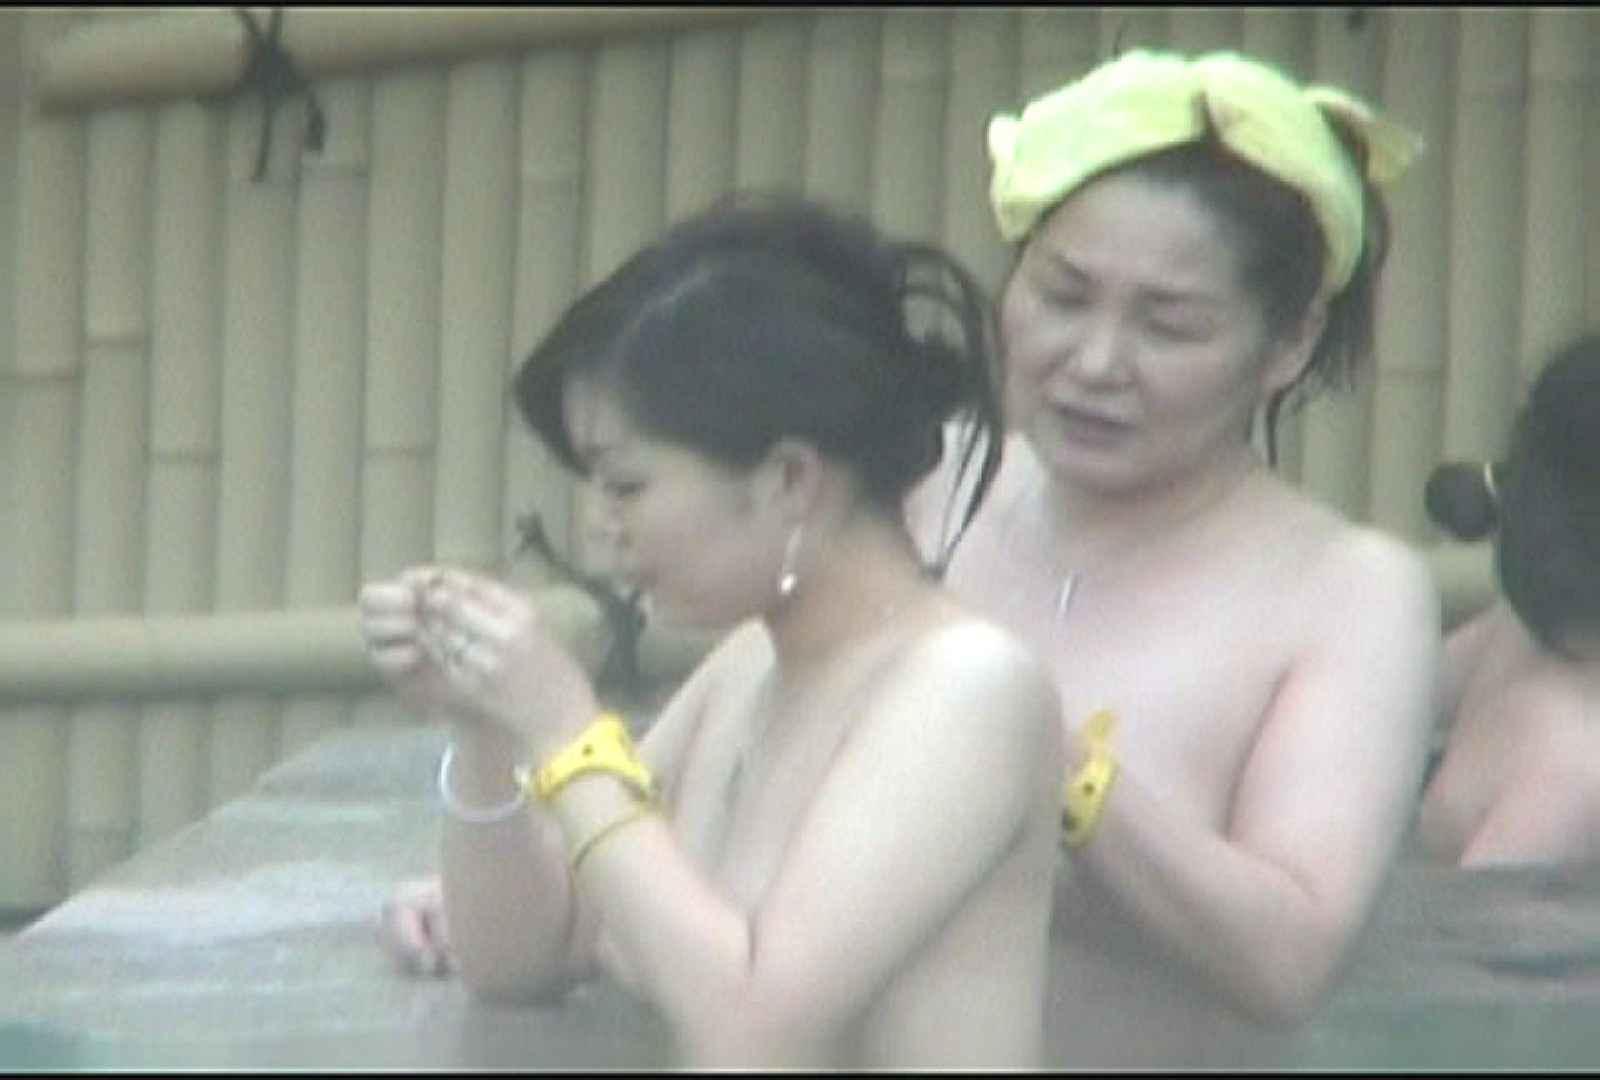 Aquaな露天風呂Vol.145 盗撮 | OLセックス  106画像 61